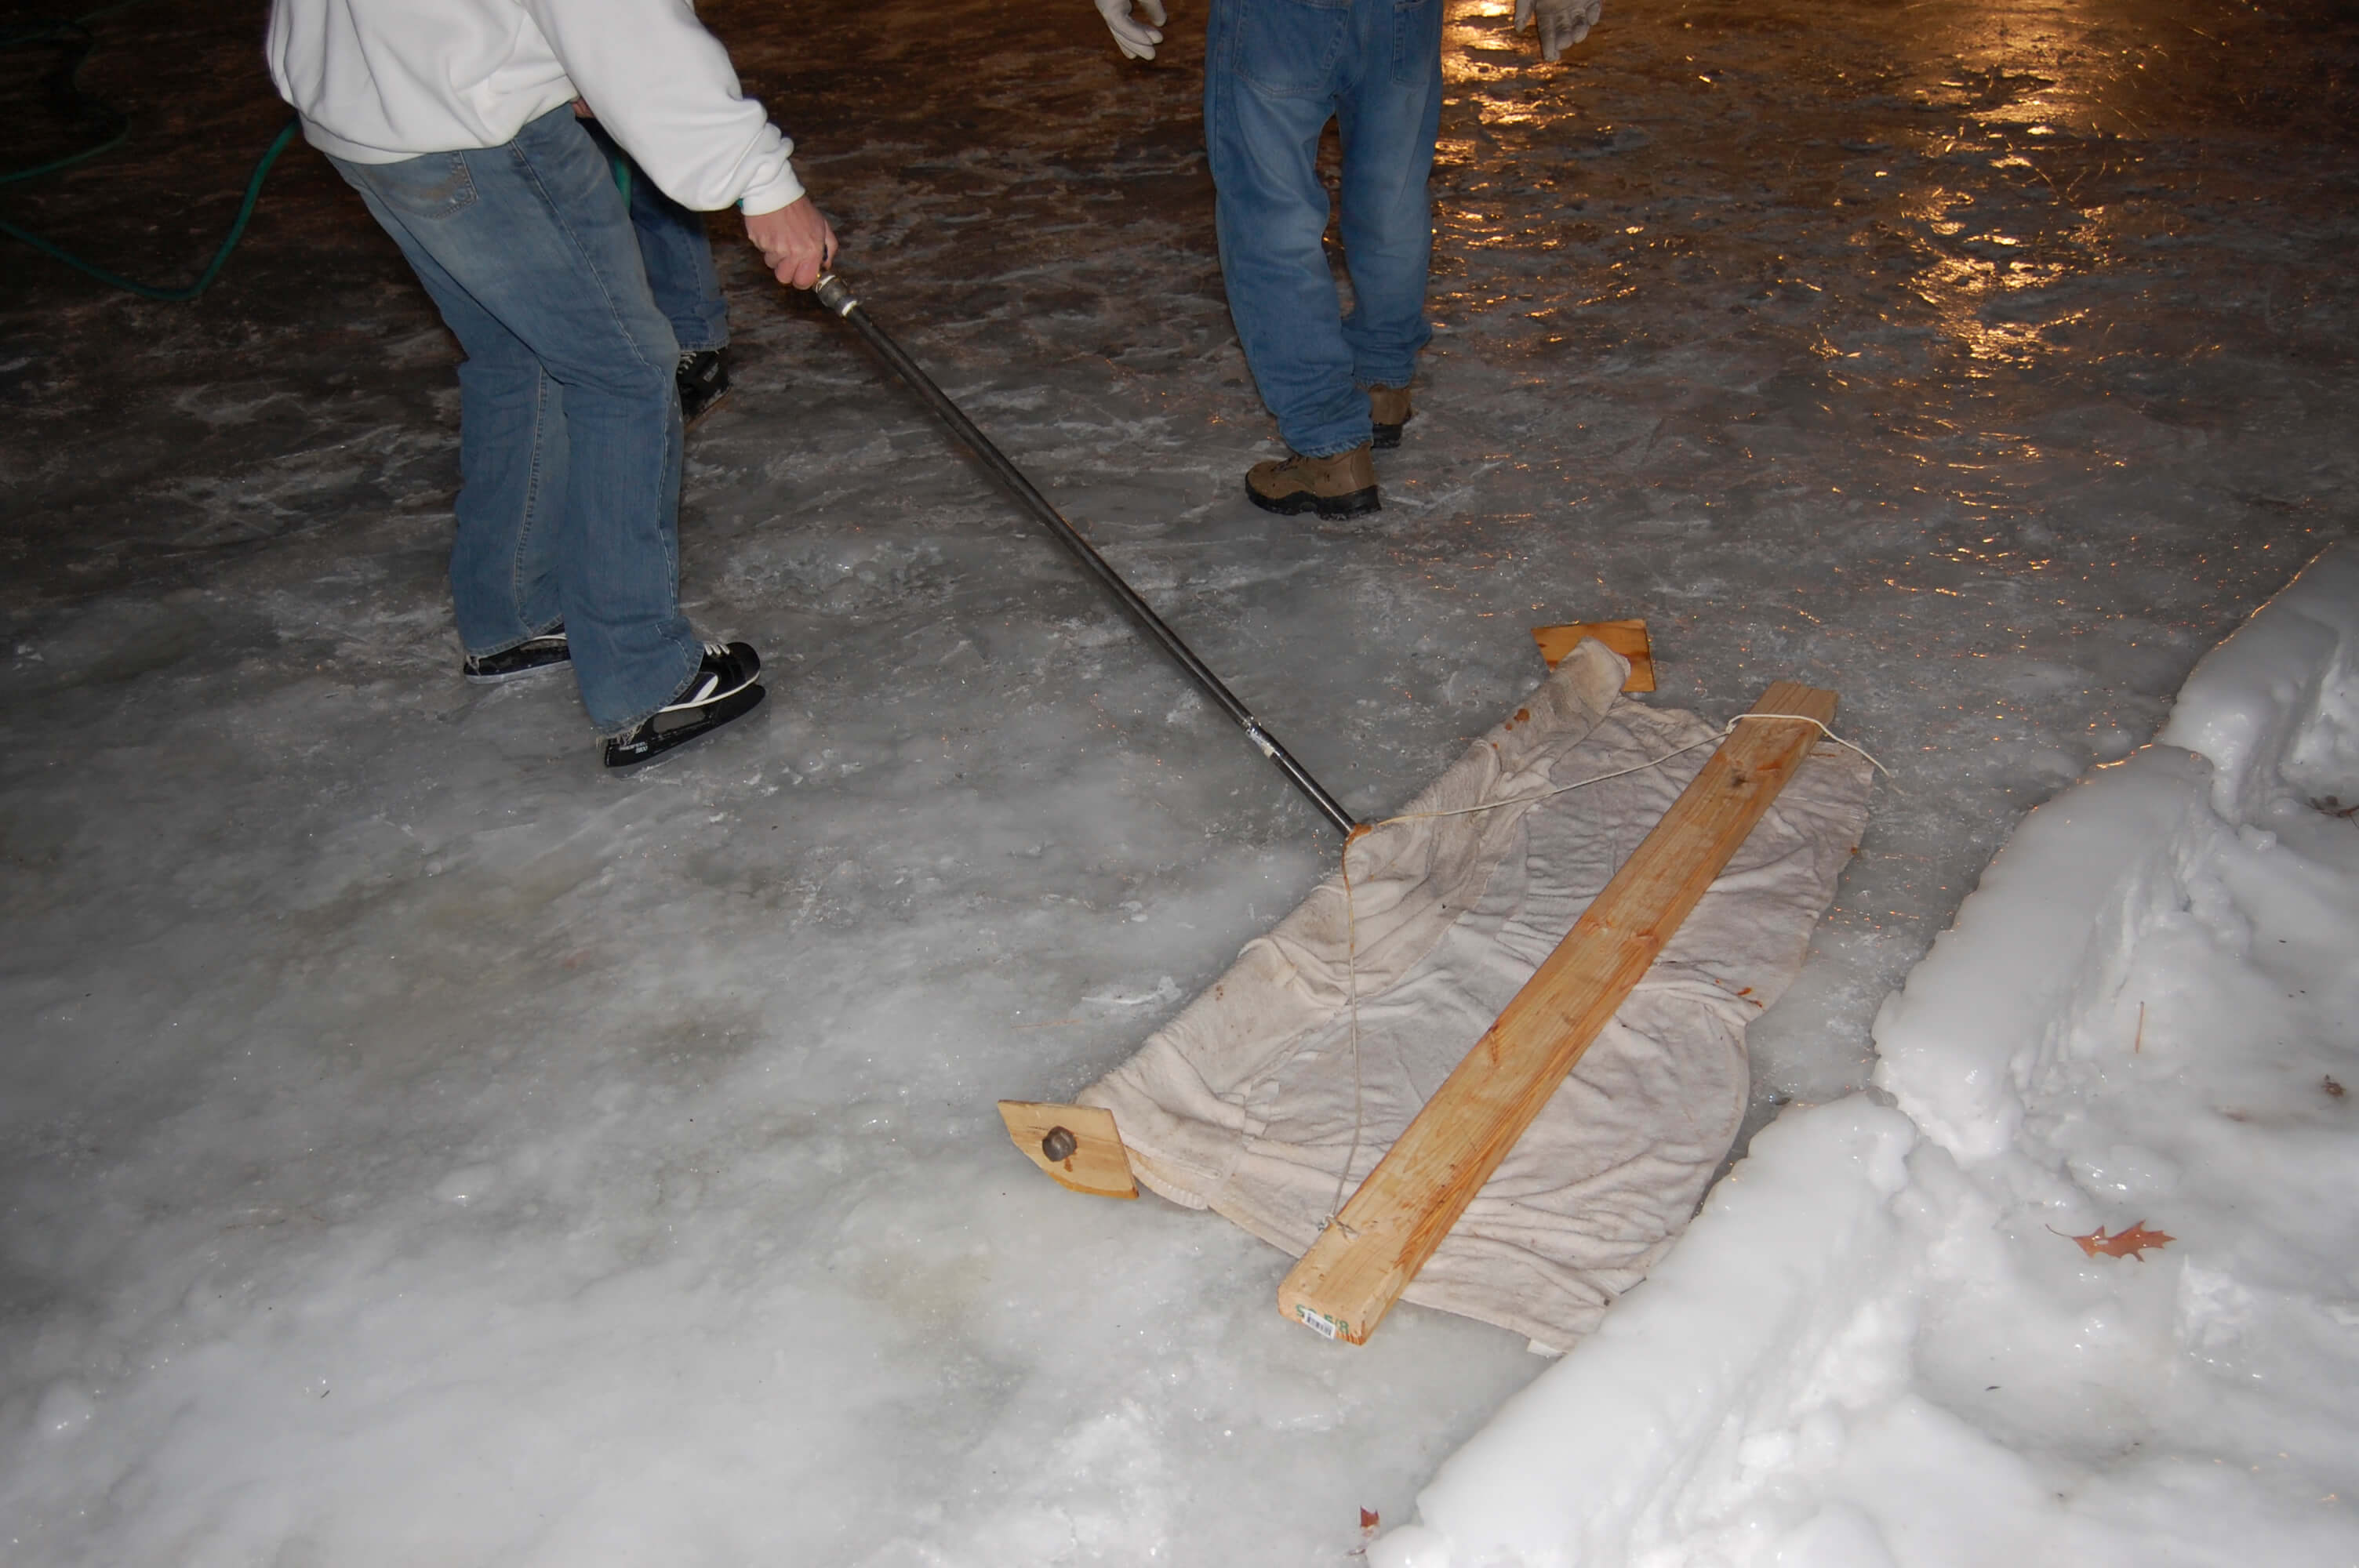 Maintenance-of-a-backyard-ice-rink